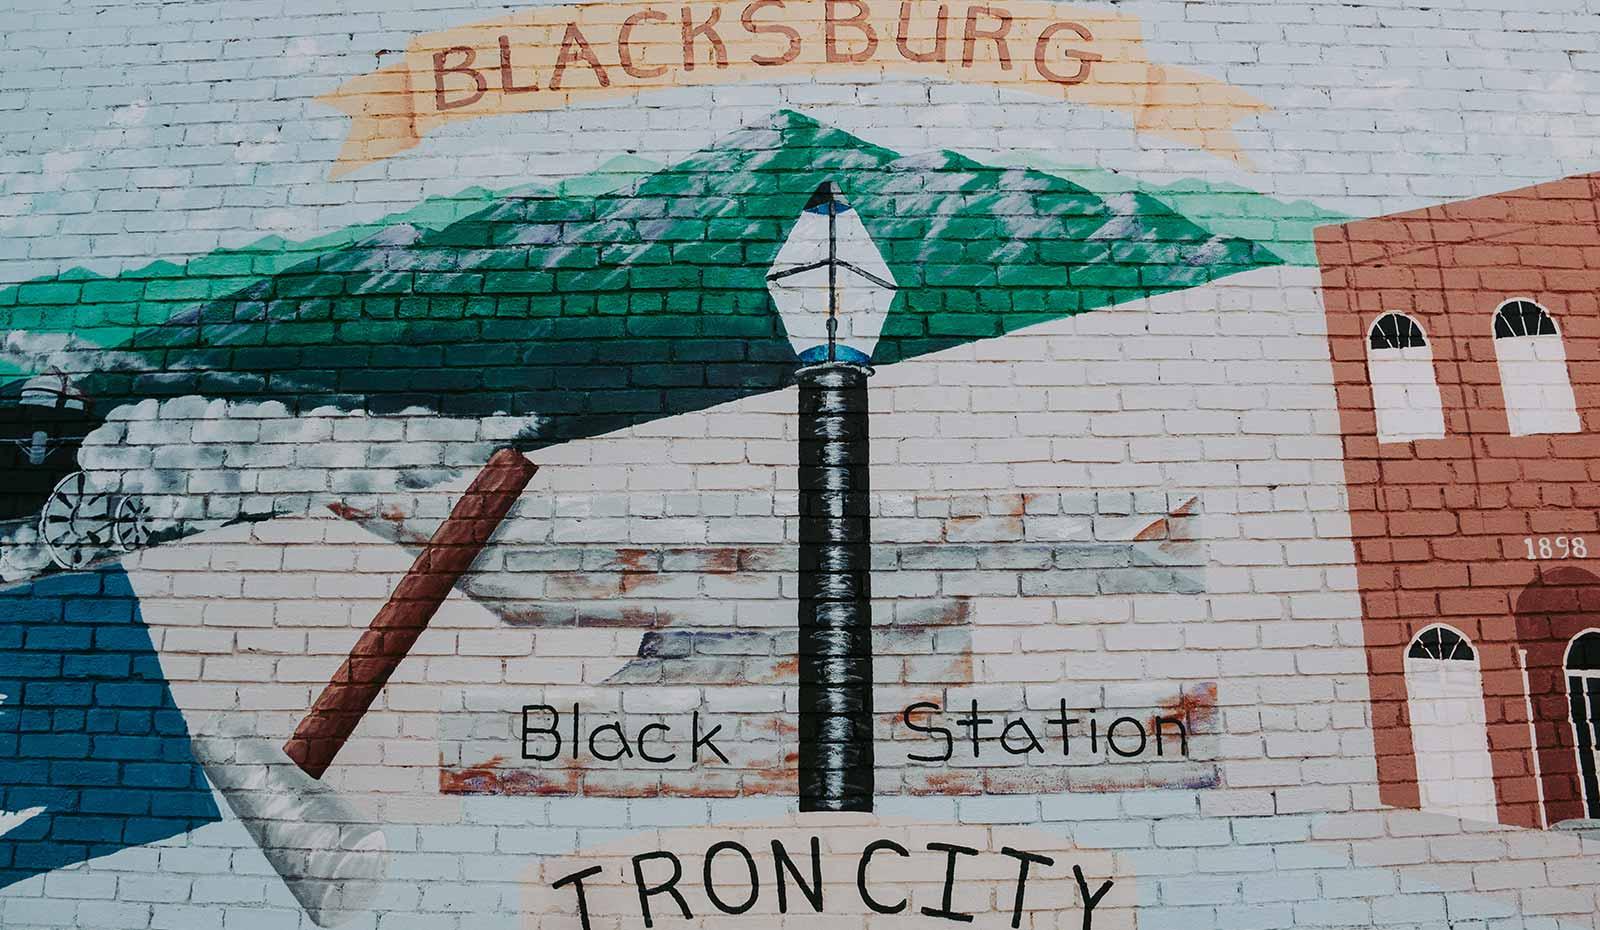 blacksbrug mural